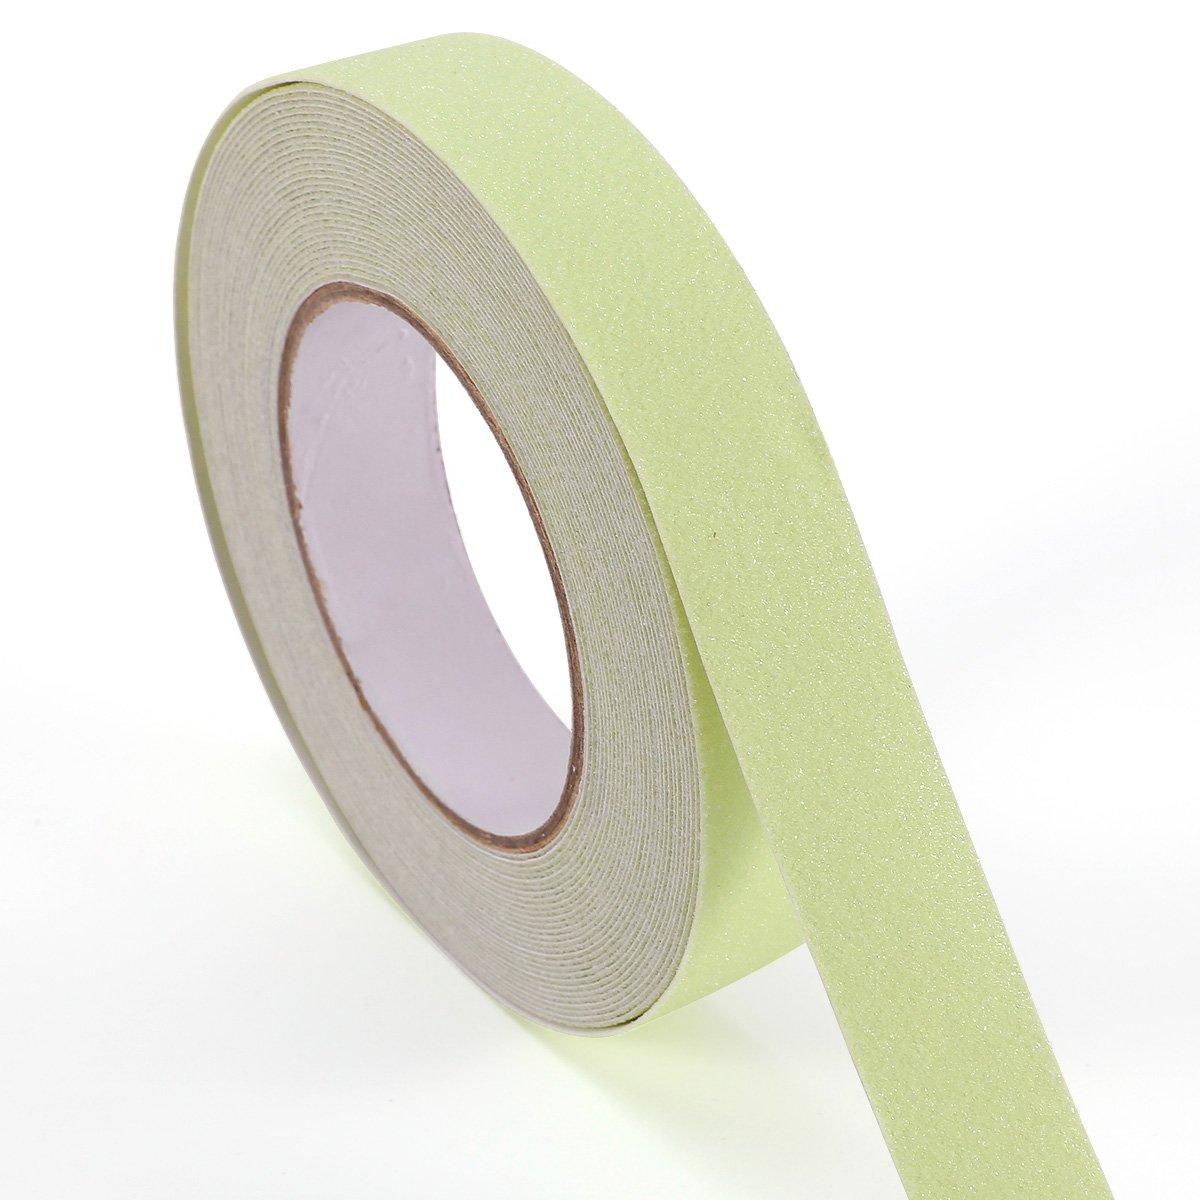 SurePromise 10m x 25mm Phosphor Phosphor Non-Slip Tape Tape Anti Slip Stair Glow-in-the-Dark